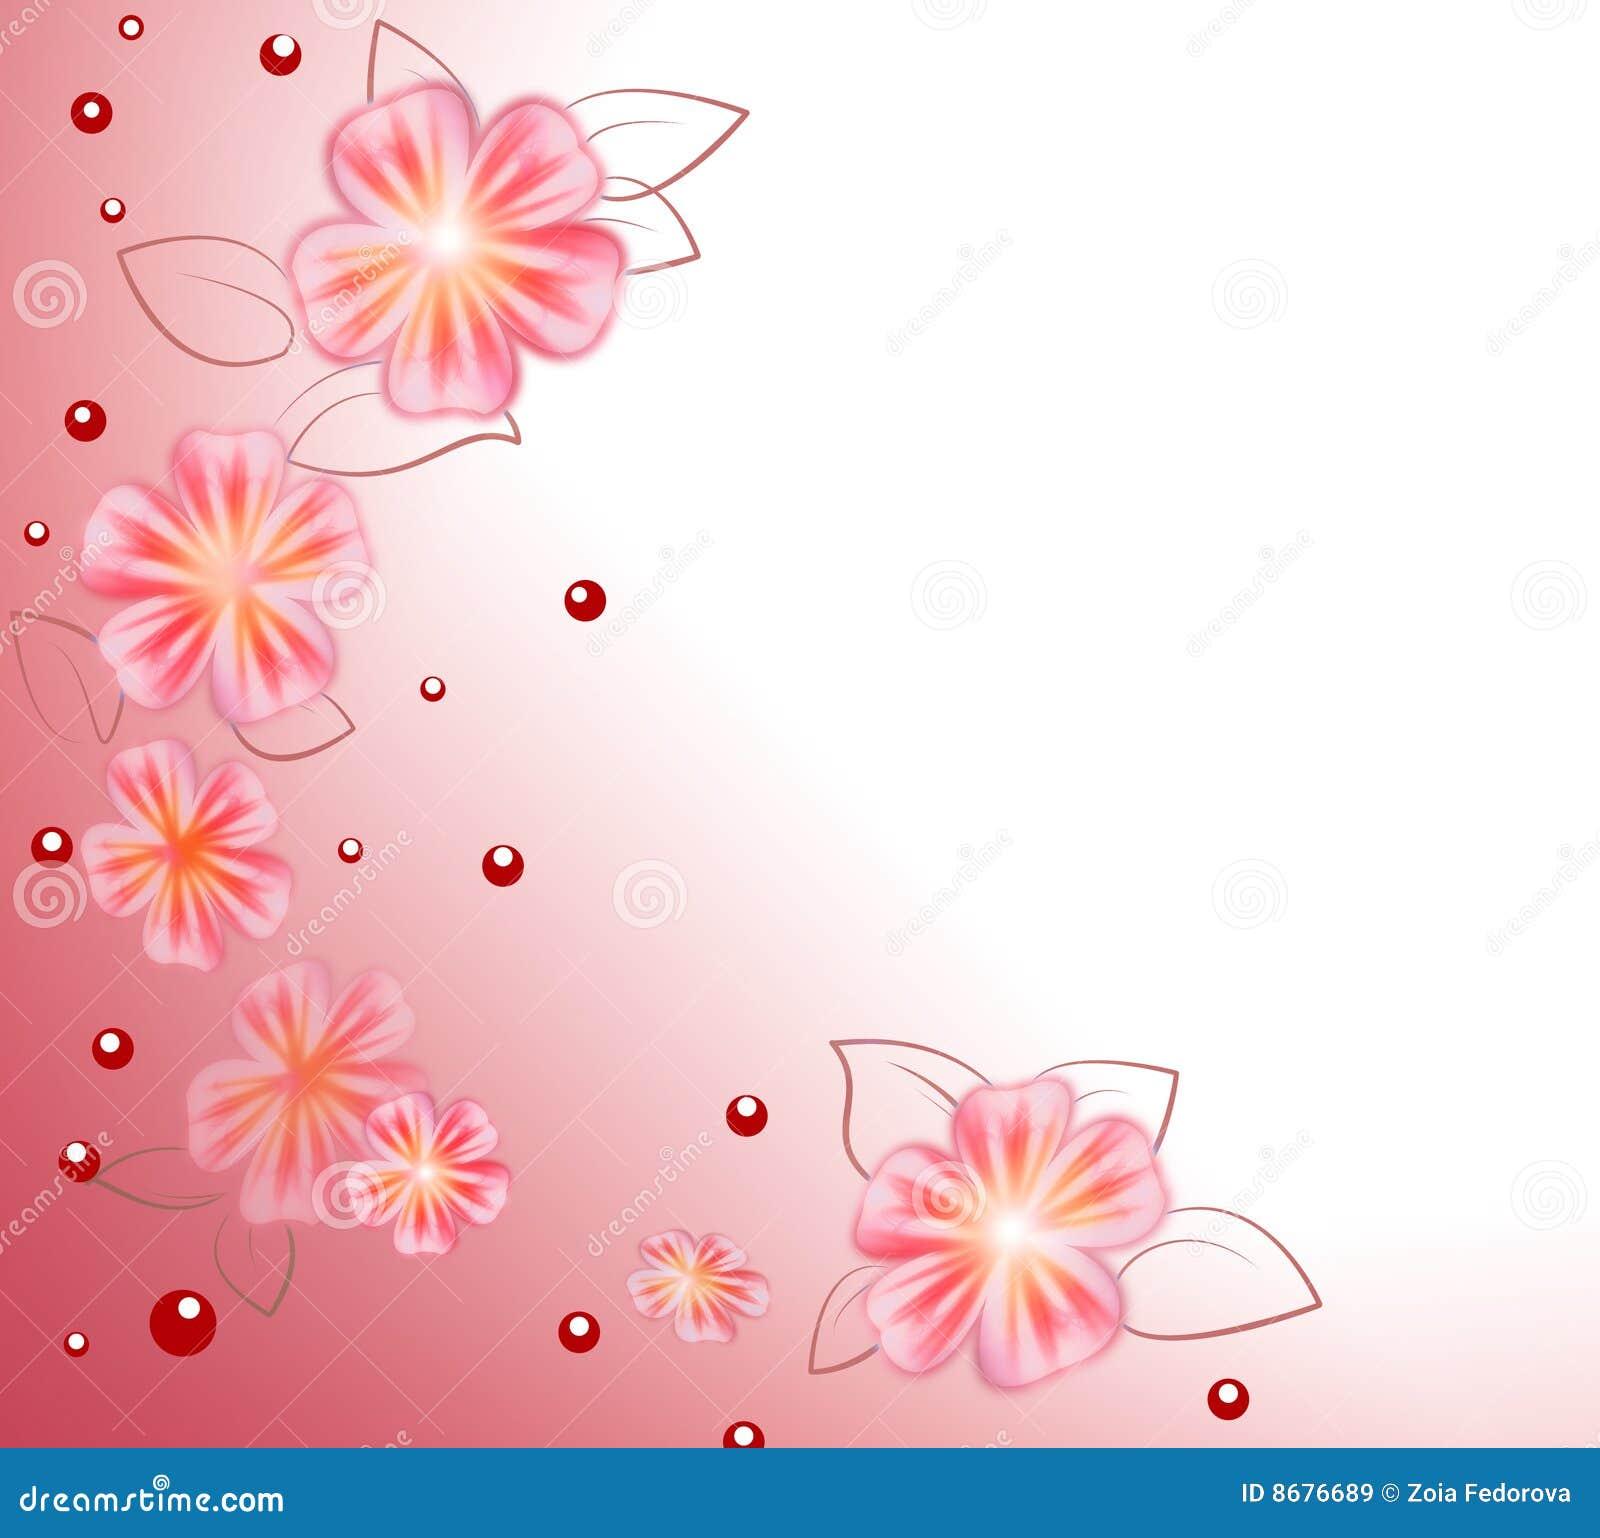 Pink flower background stock illustration illustration of pink flower background mightylinksfo